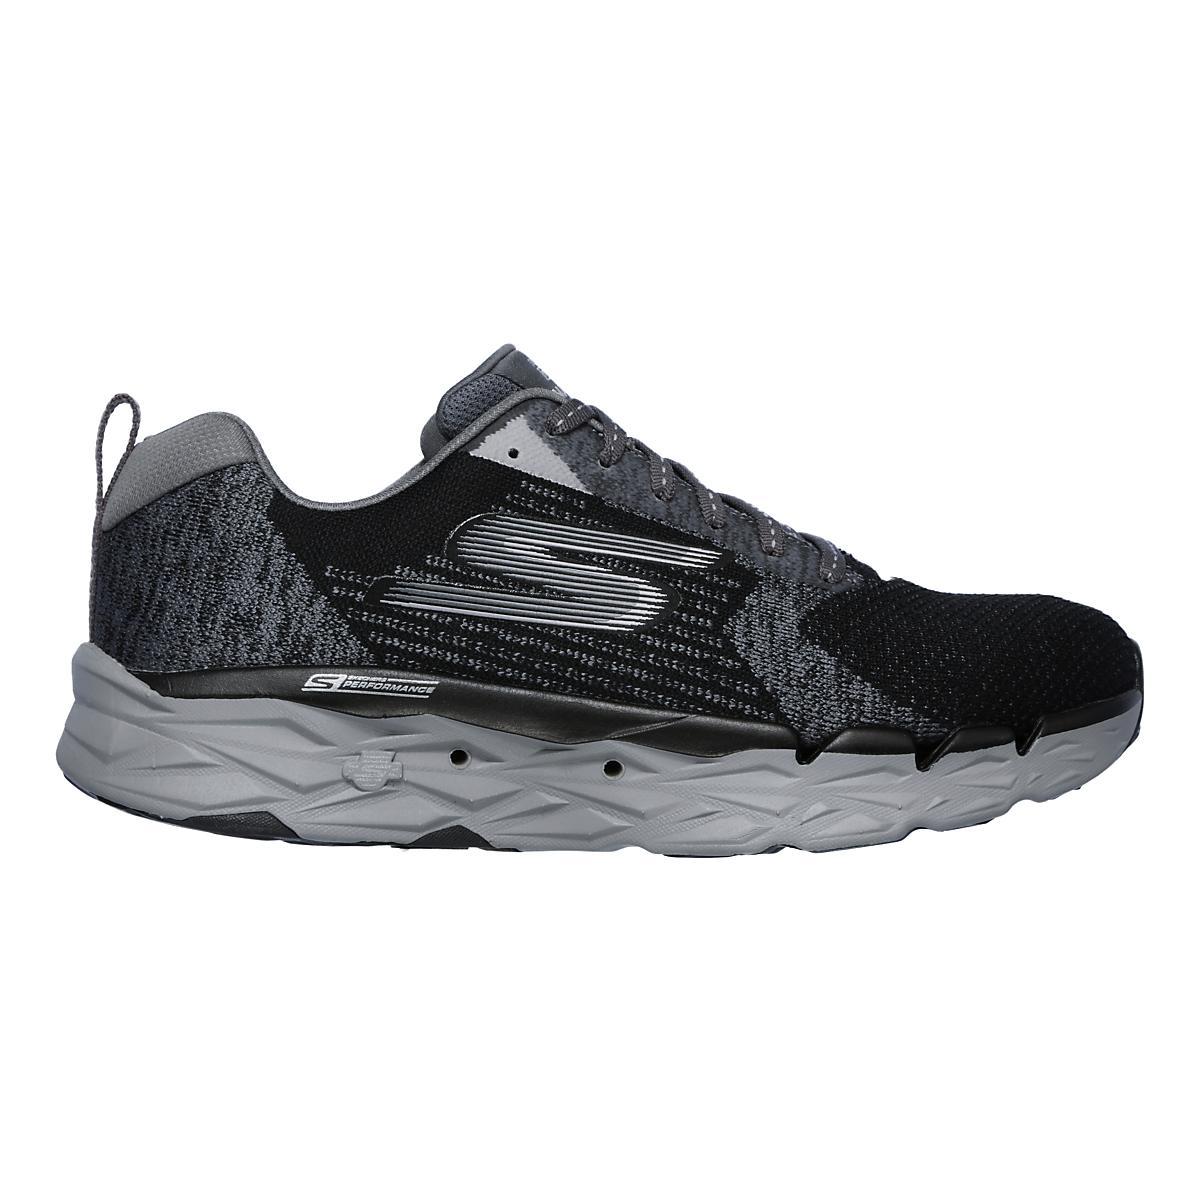 Mens Skechers GO Run Max Road 3 Running Shoe at Road Runner Sports 2a69d1e235